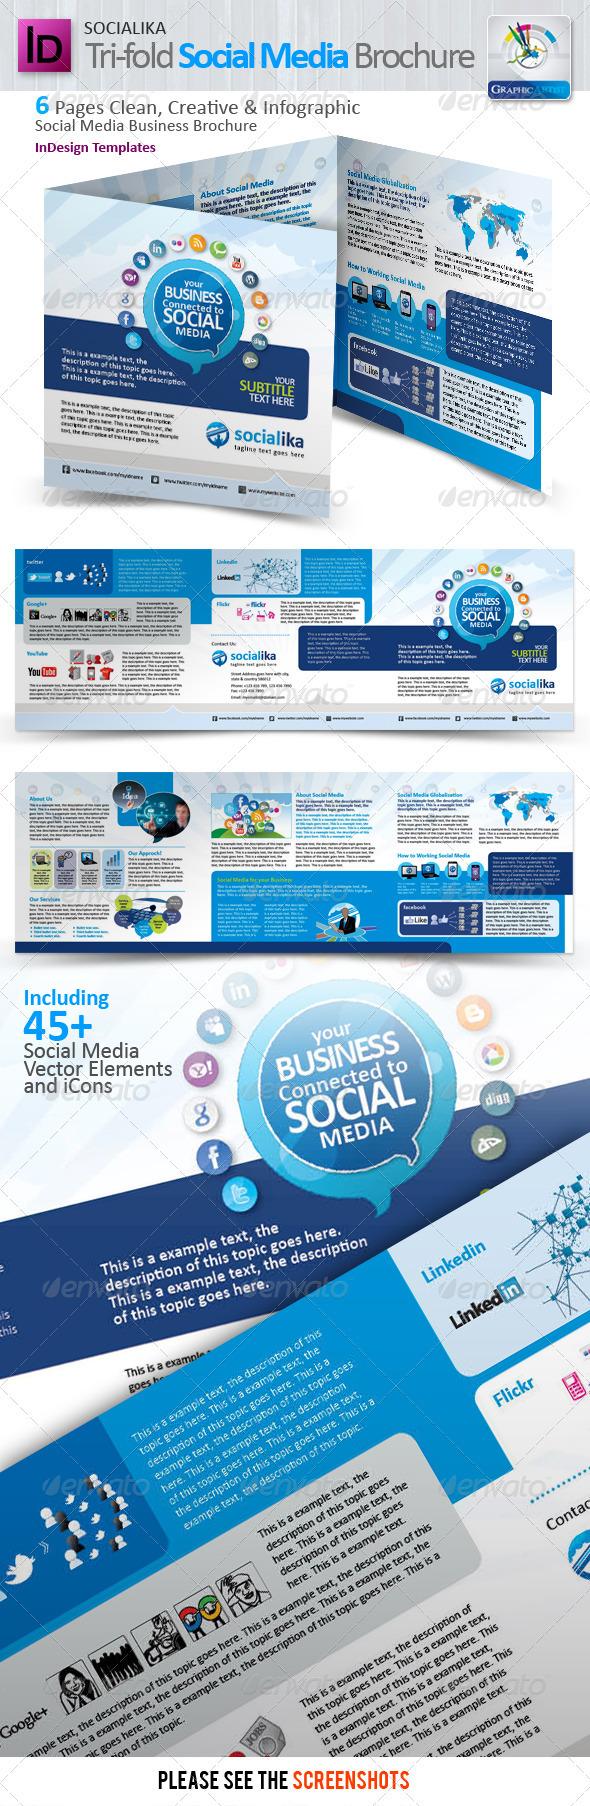 Socialika Tri-fold Social Media Brochure - Corporate Brochures